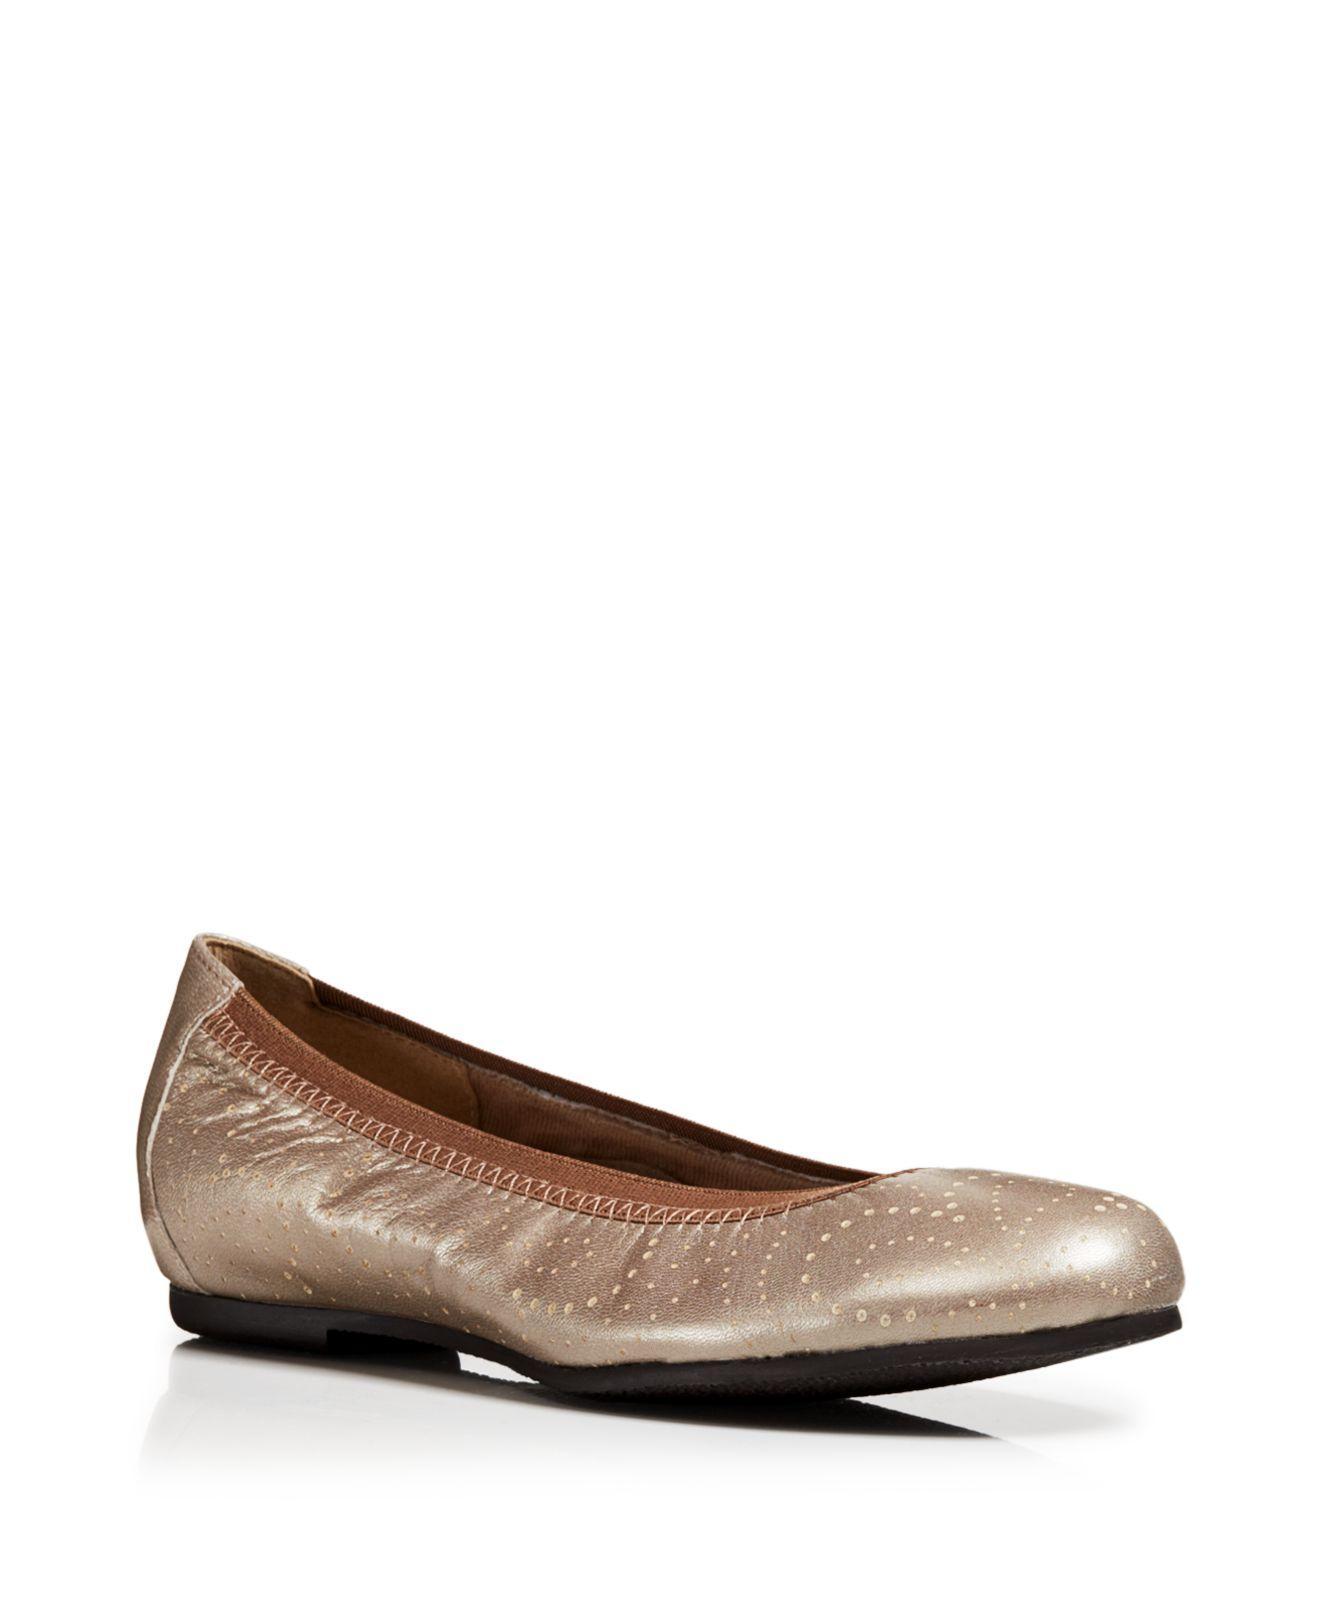 Munro Shoes Flats